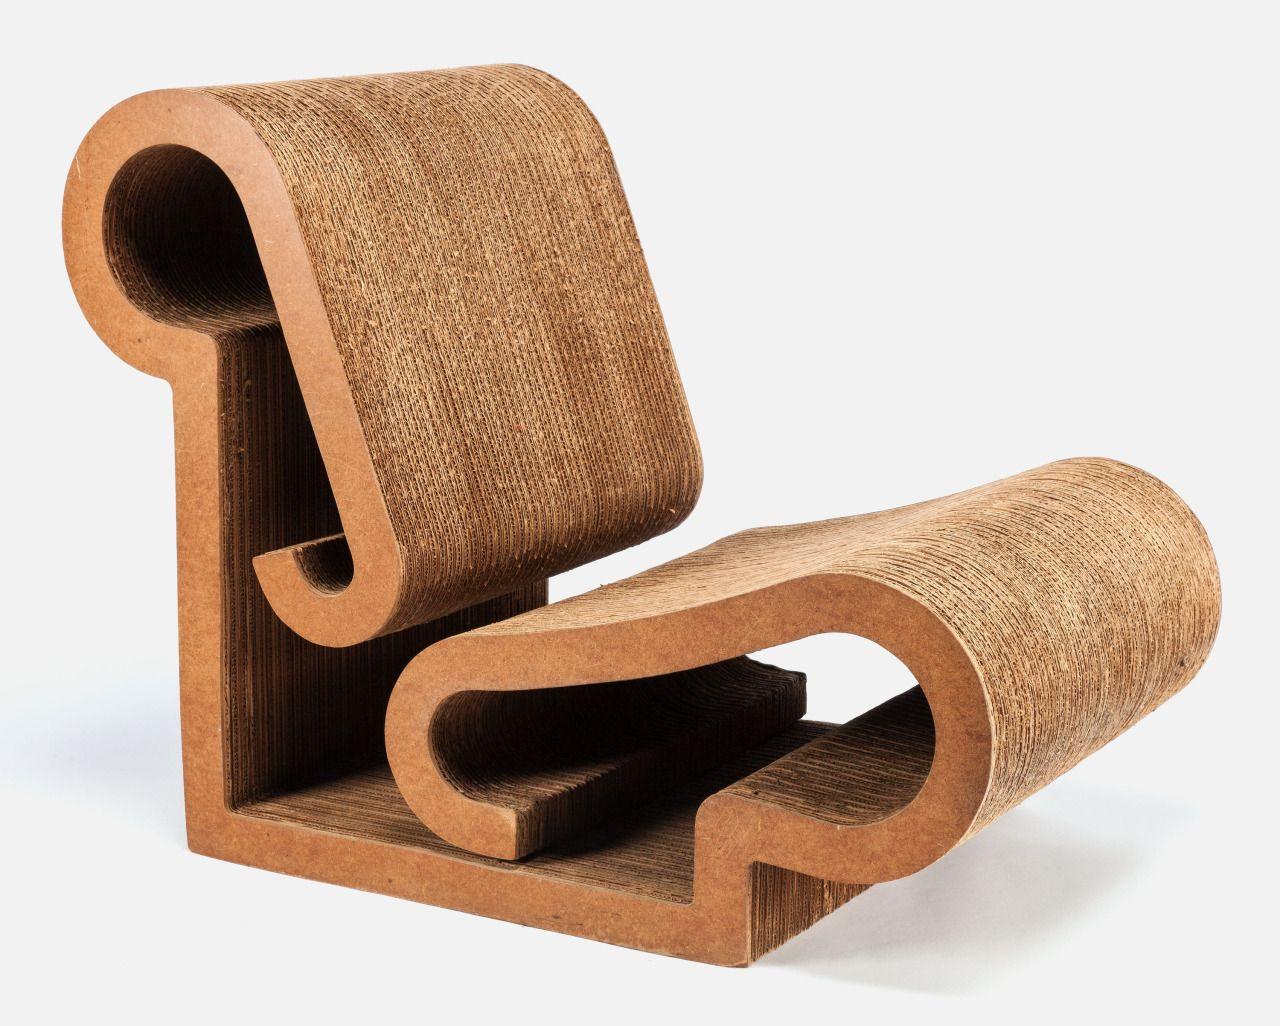 Frank Gehry Pinned By Www Modlar Com Furniture Pinterest  # Frank Gehry Muebles De Carton